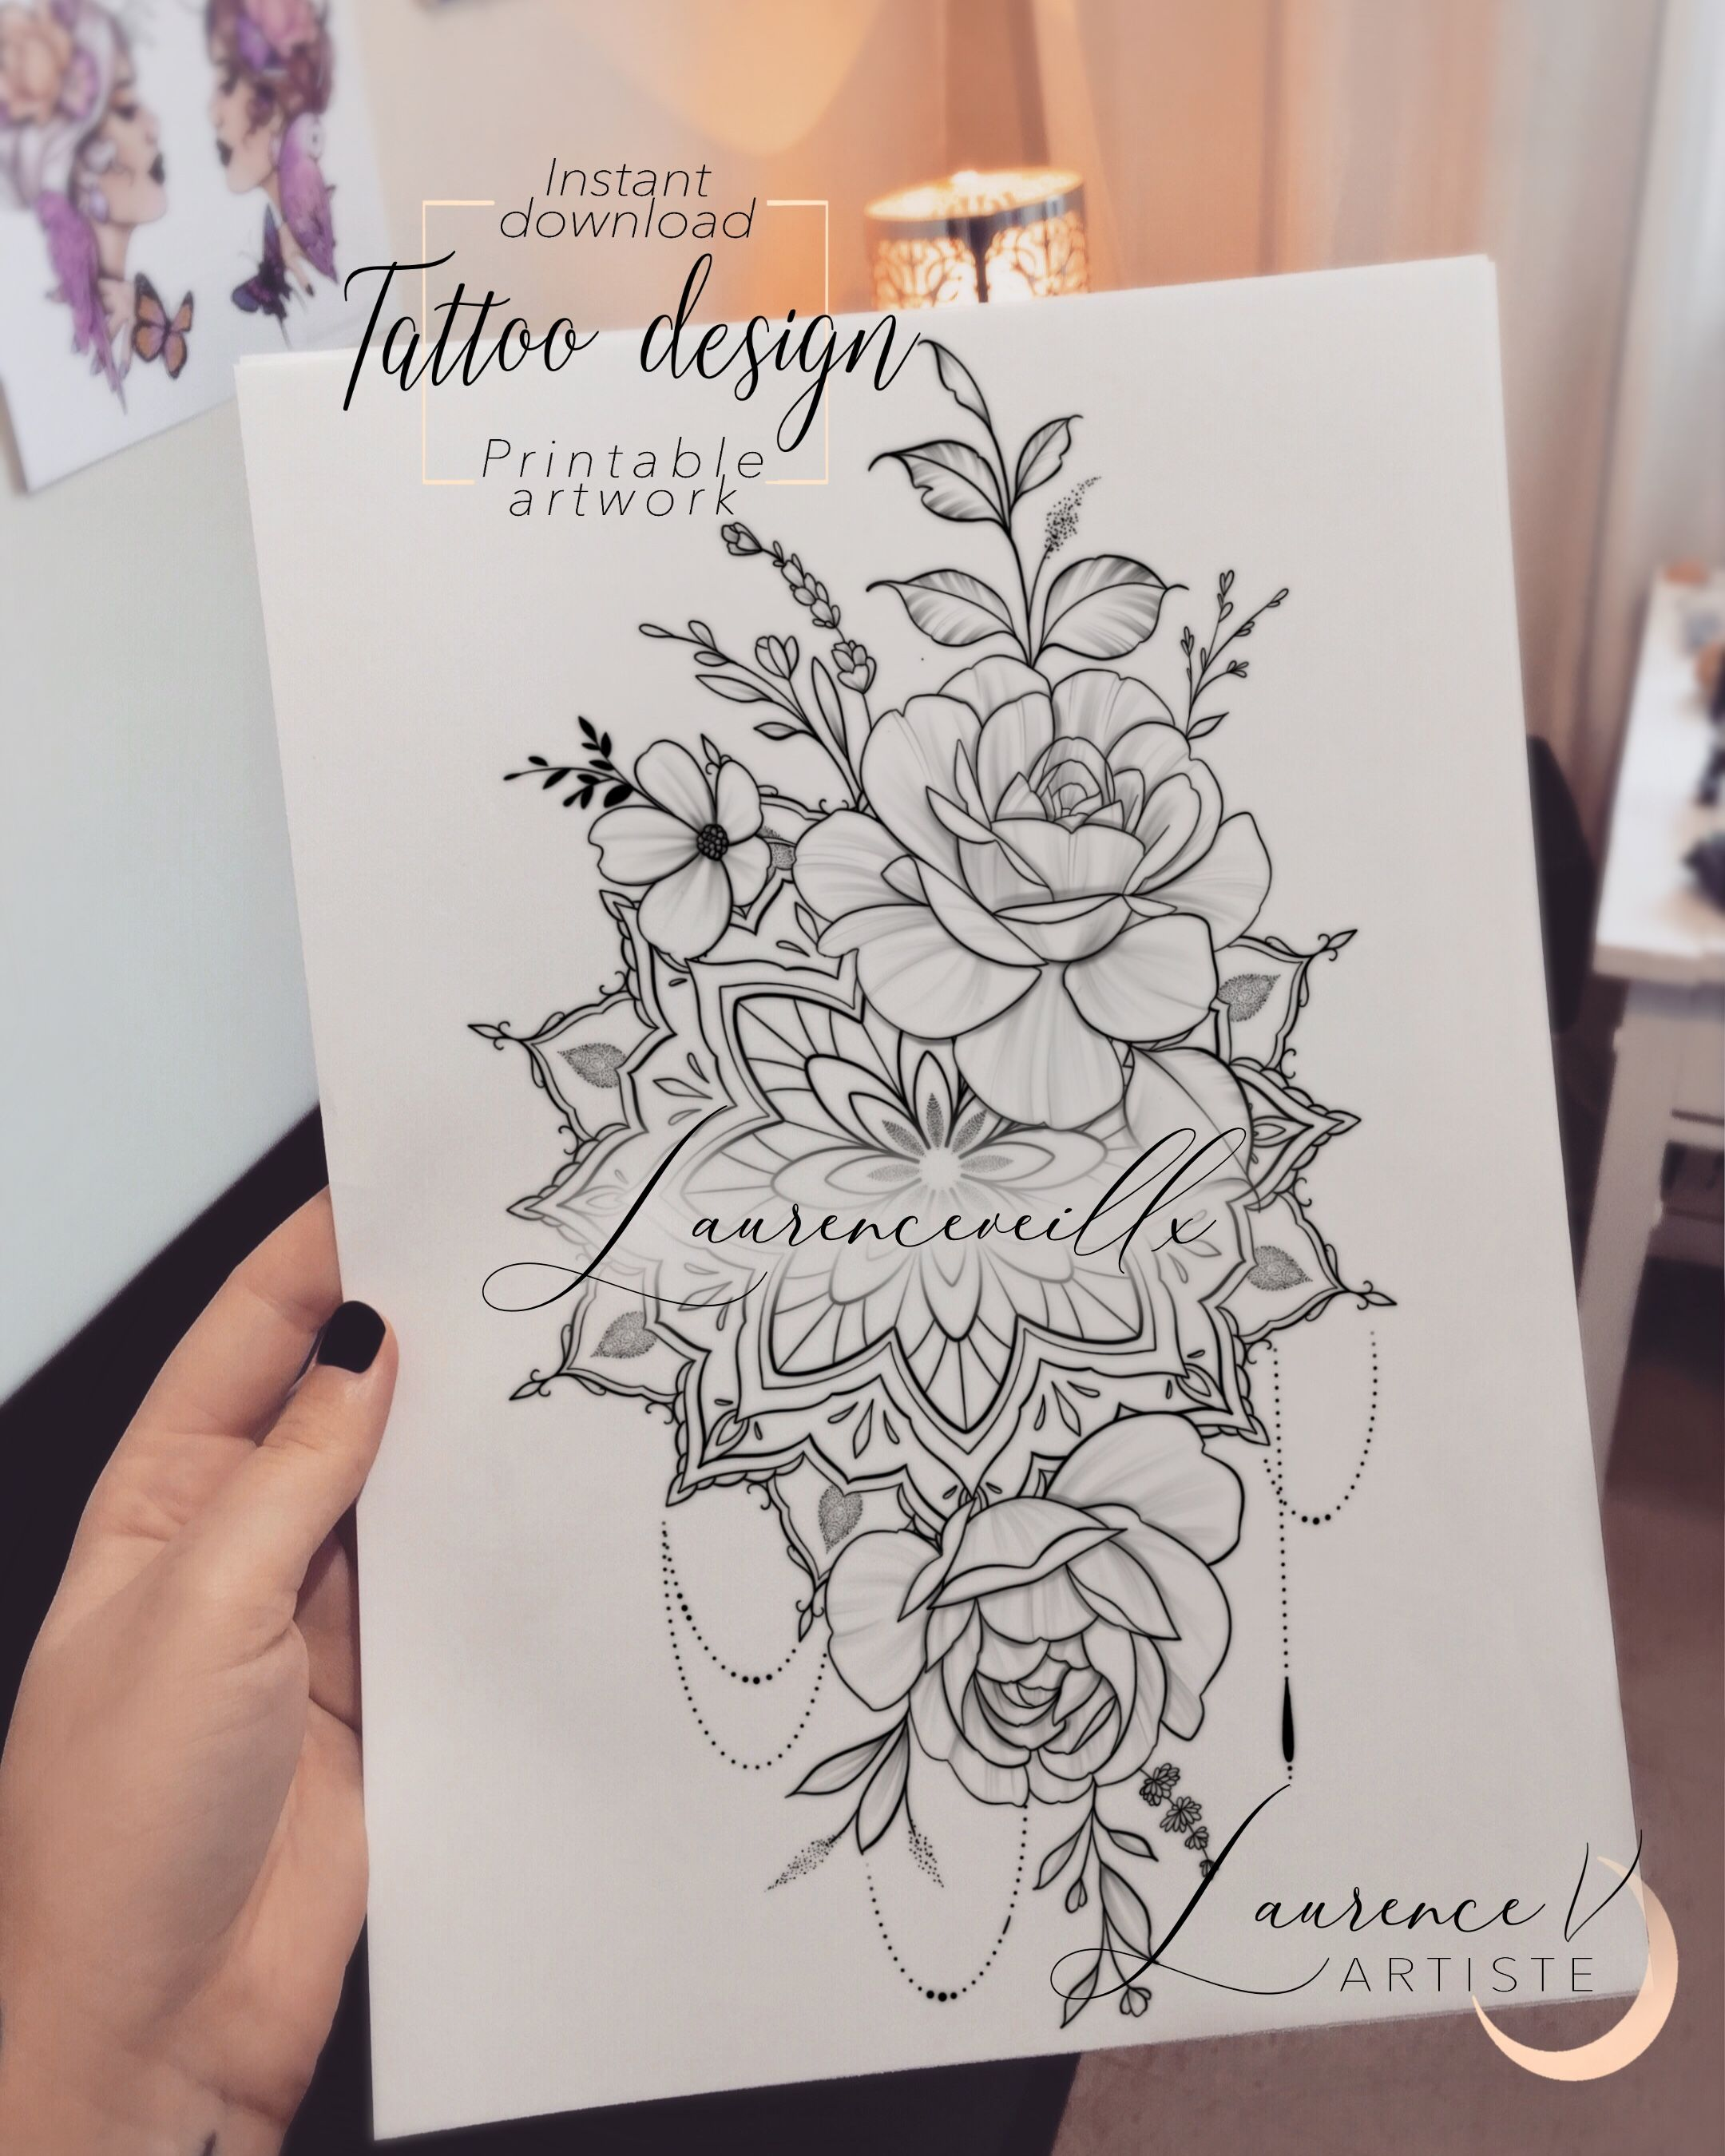 Mandala Flower Rose Tattoo Design Instant Download Laurenceveillx In 2020 Unique Half Sleeve Tattoos Floral Mandala Tattoo Mandala Tattoo Design